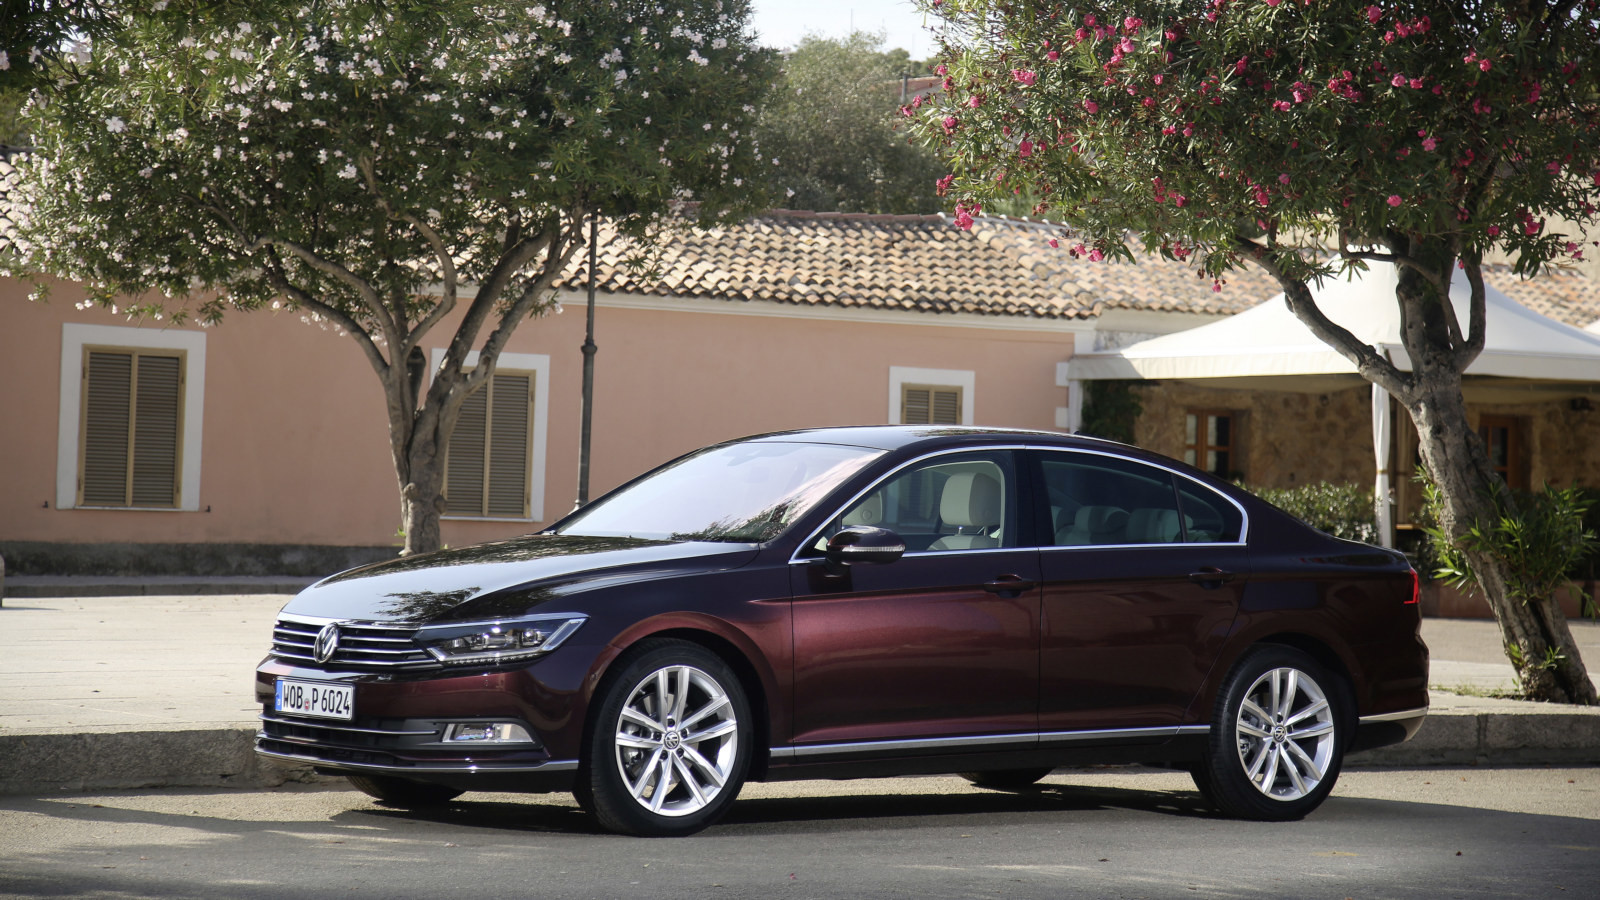 Втри раза возросла продажа автомобиля «Tiguan» калужской сборки